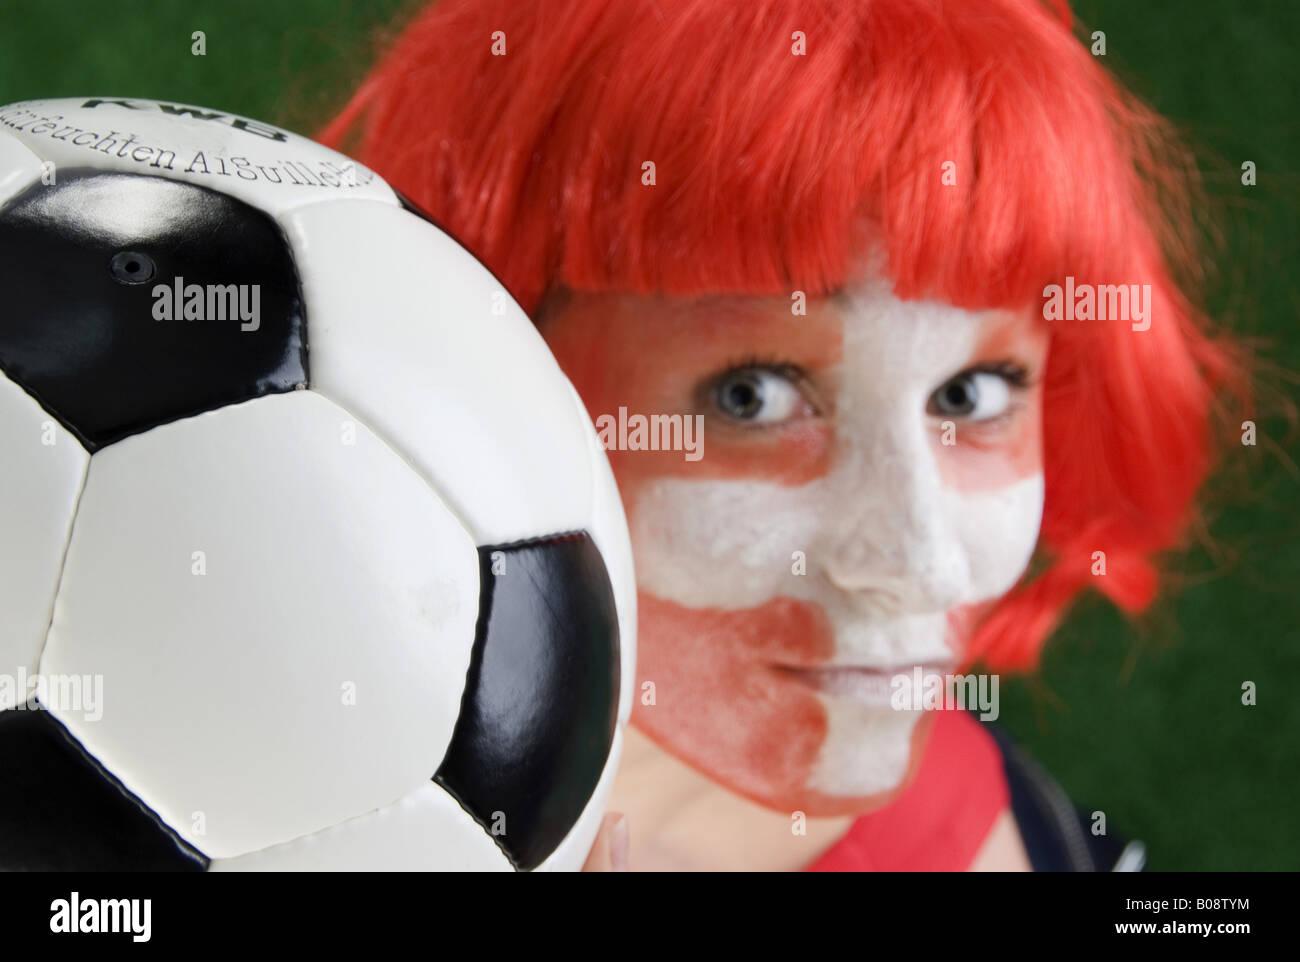 woman as Switzerland football fan, with football - Stock Image